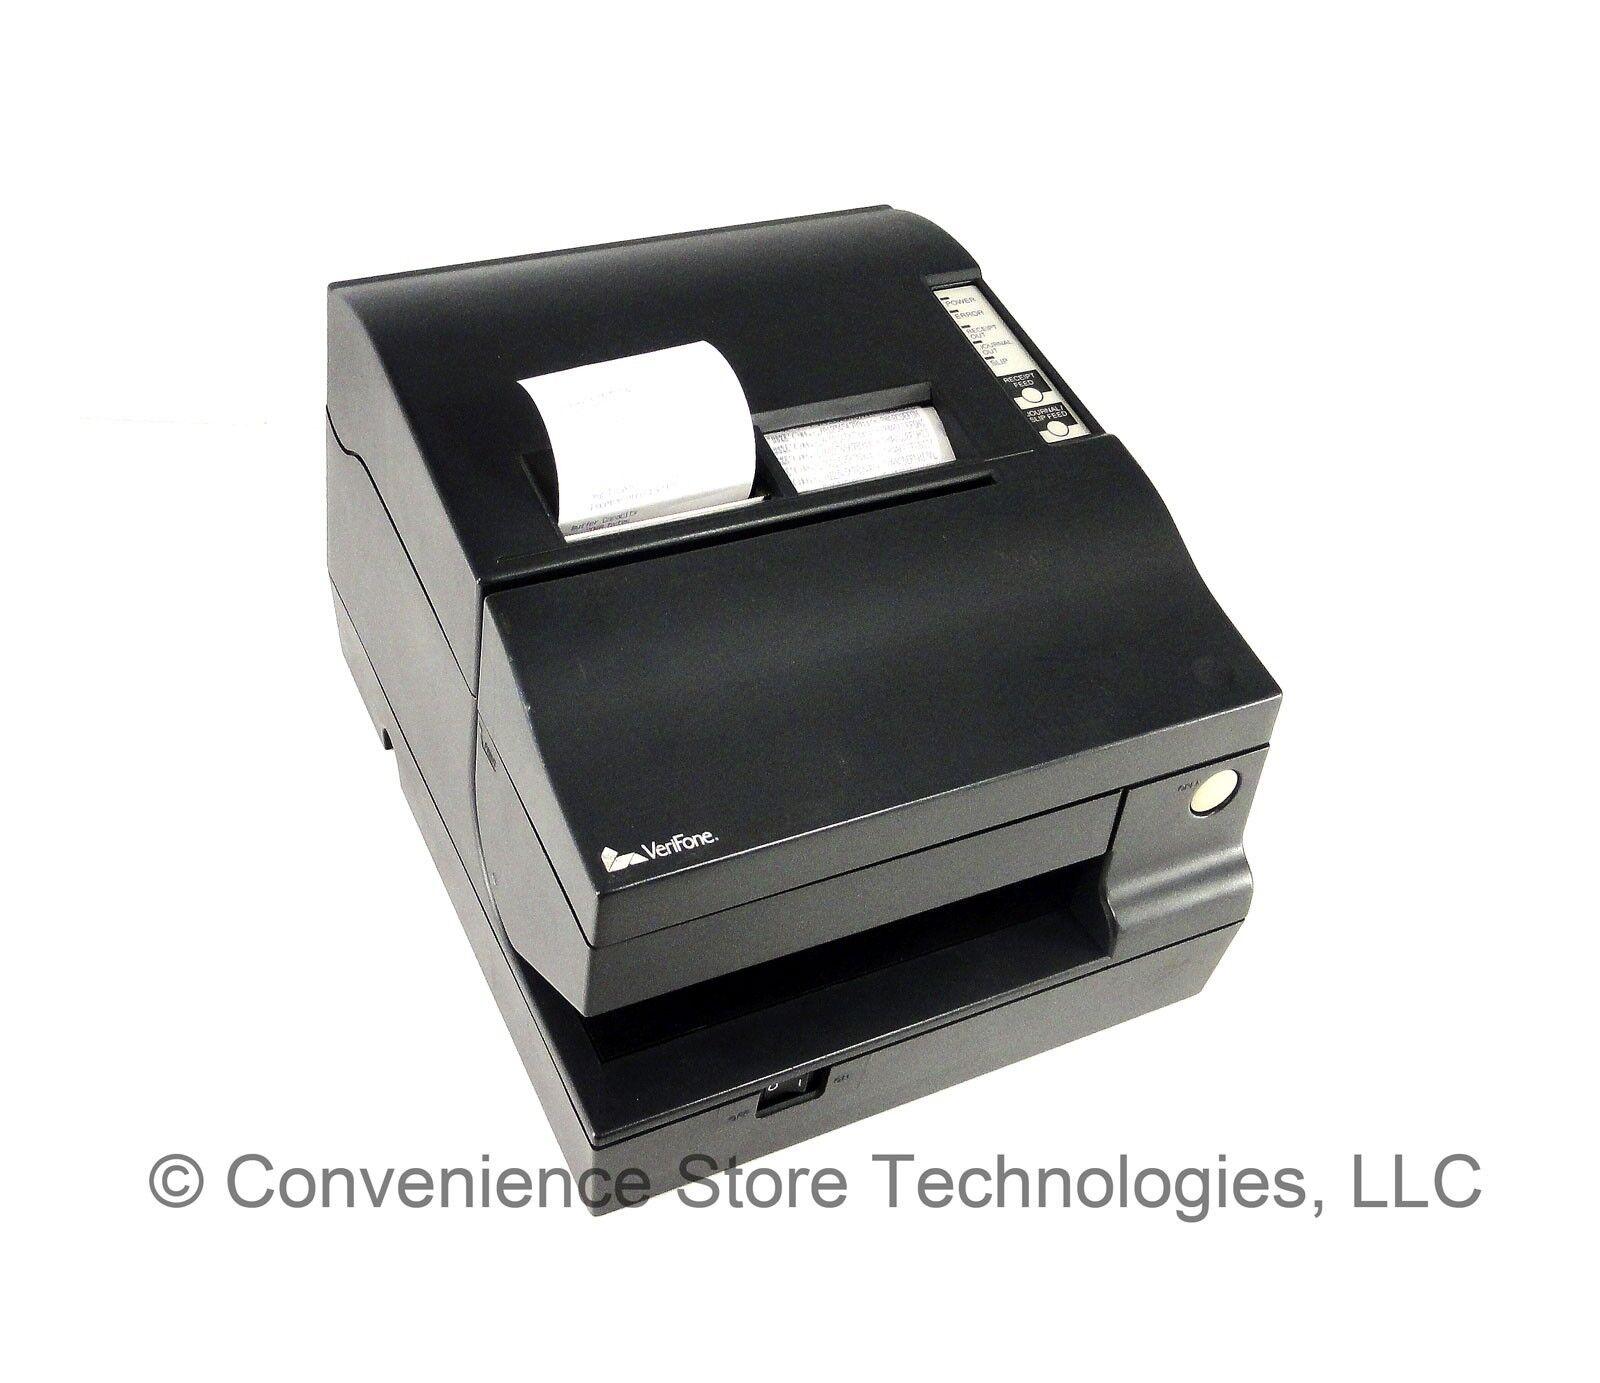 How To Make Invoice In Excel Excel Receipt Printer Ink  Best Ink  Make A Receipt Online Excel with Invoice Printer Excel Receipt Printer Posguys Qoo10 Non Receipt Claim Pdf